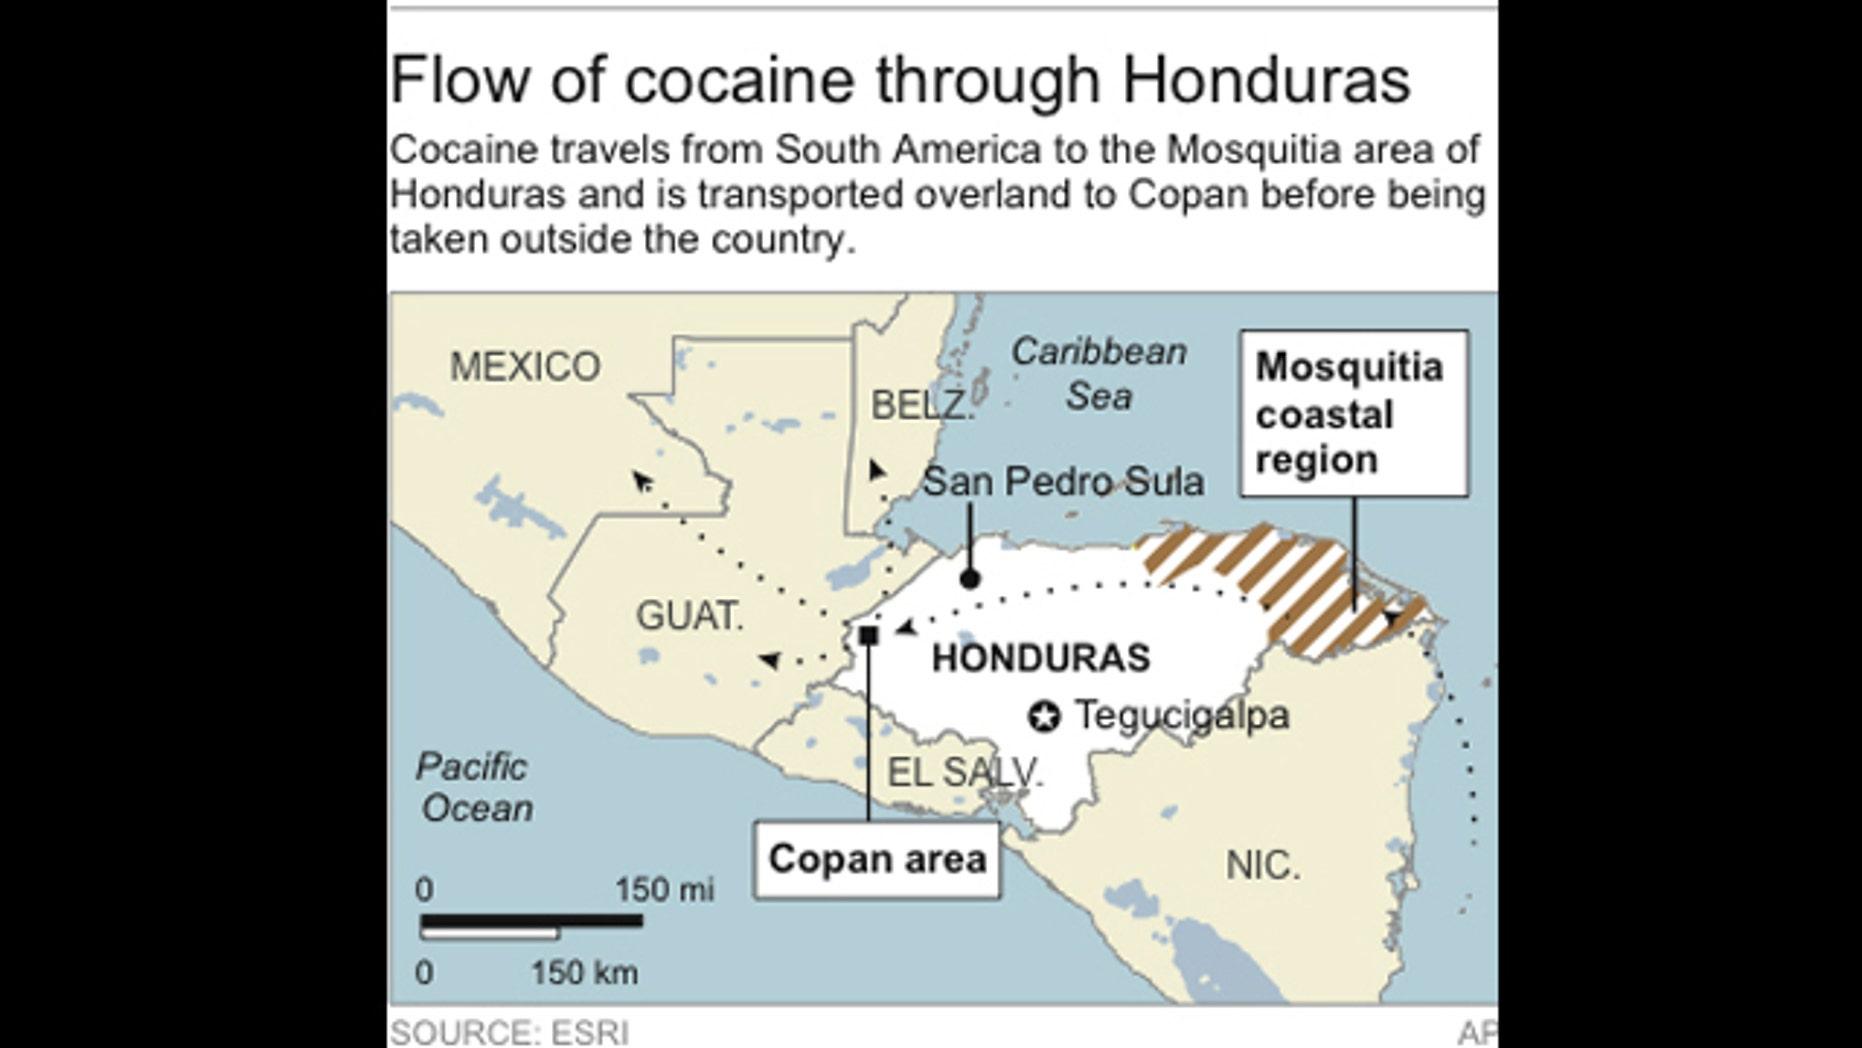 Map locates the Mosquitia coastal area and Copan area in Honduras